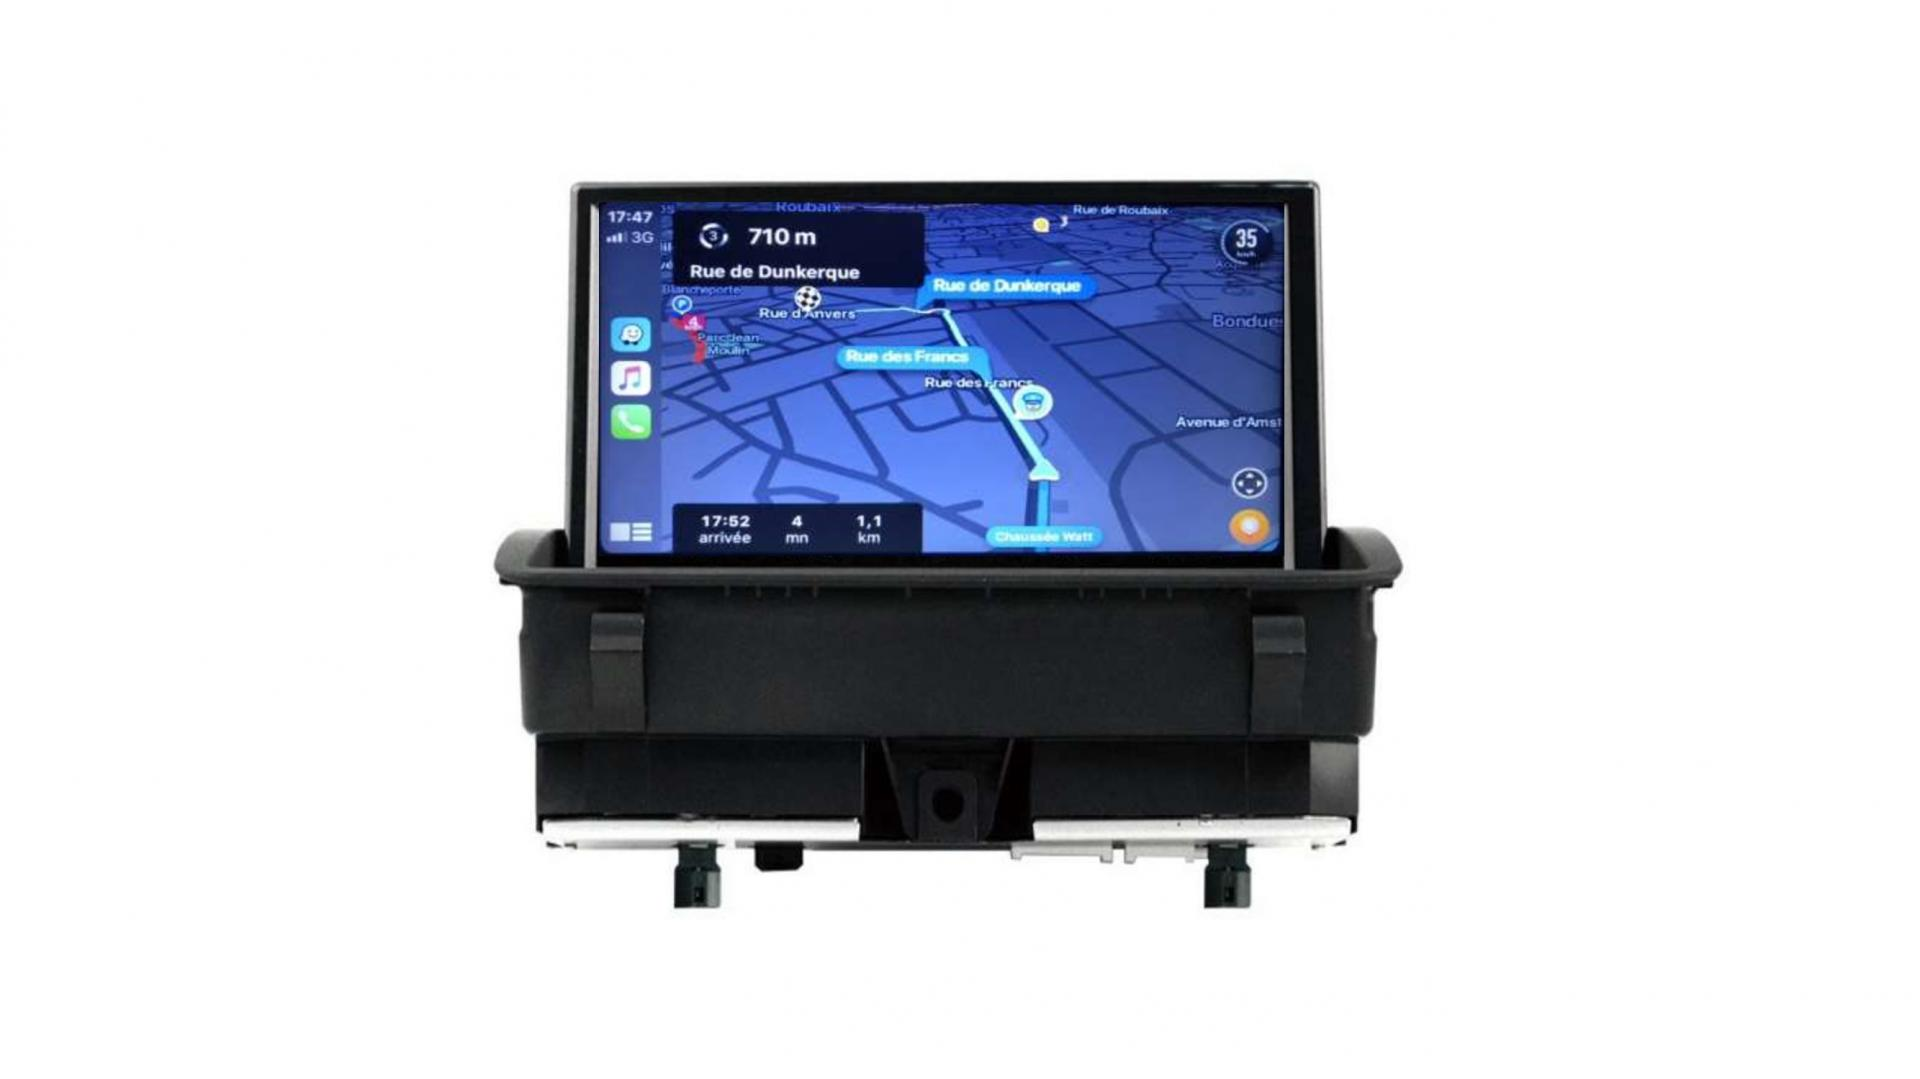 Audi q3 408 rcz autoradio gps bluetooth android auto carplay camera de recul commande au volant4